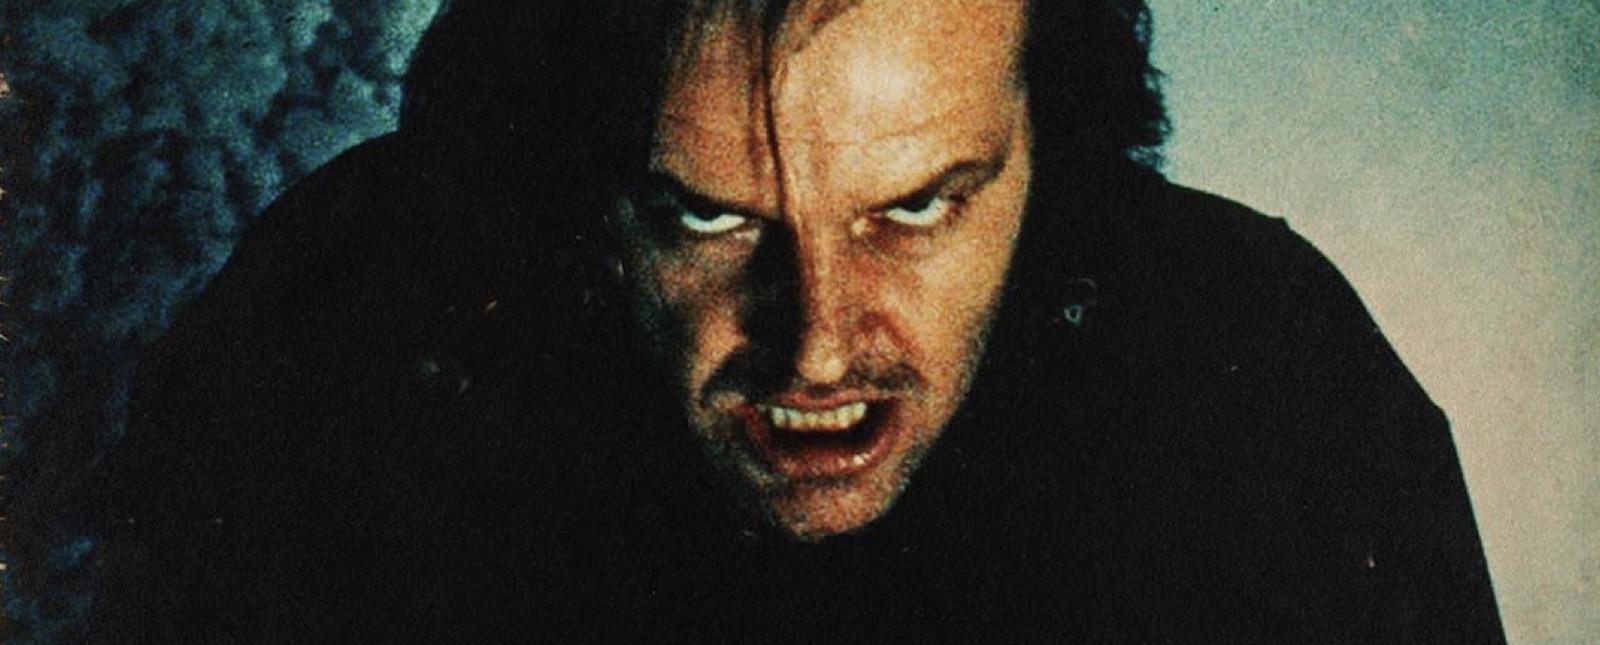 best-movies-psychological-thriller-horror-film